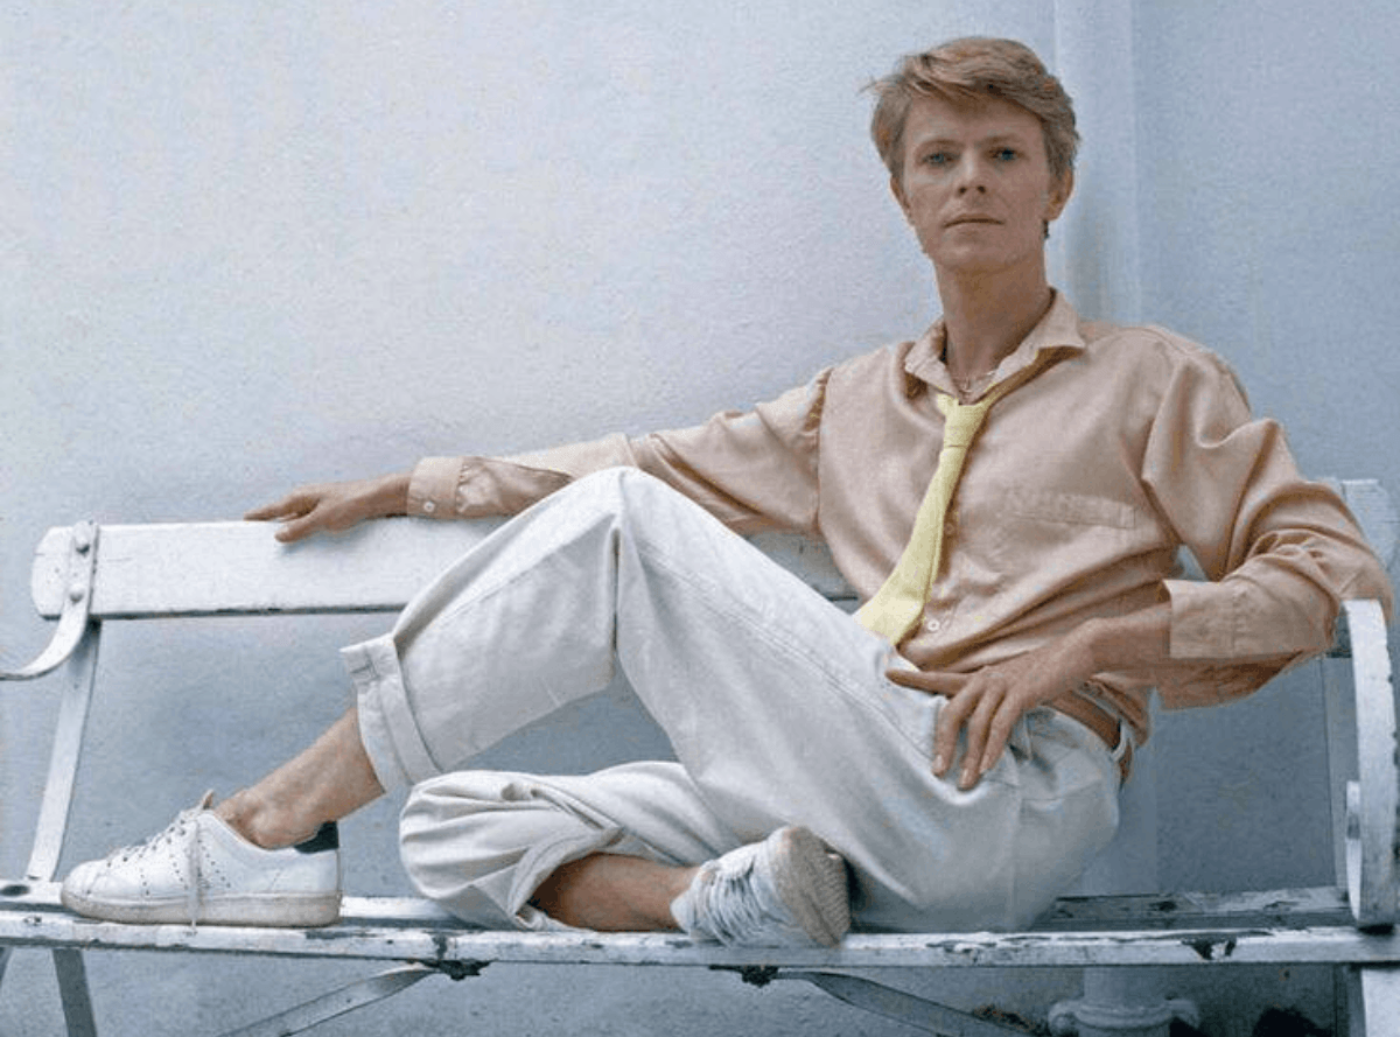 Was David Bowie an Adidas fan?